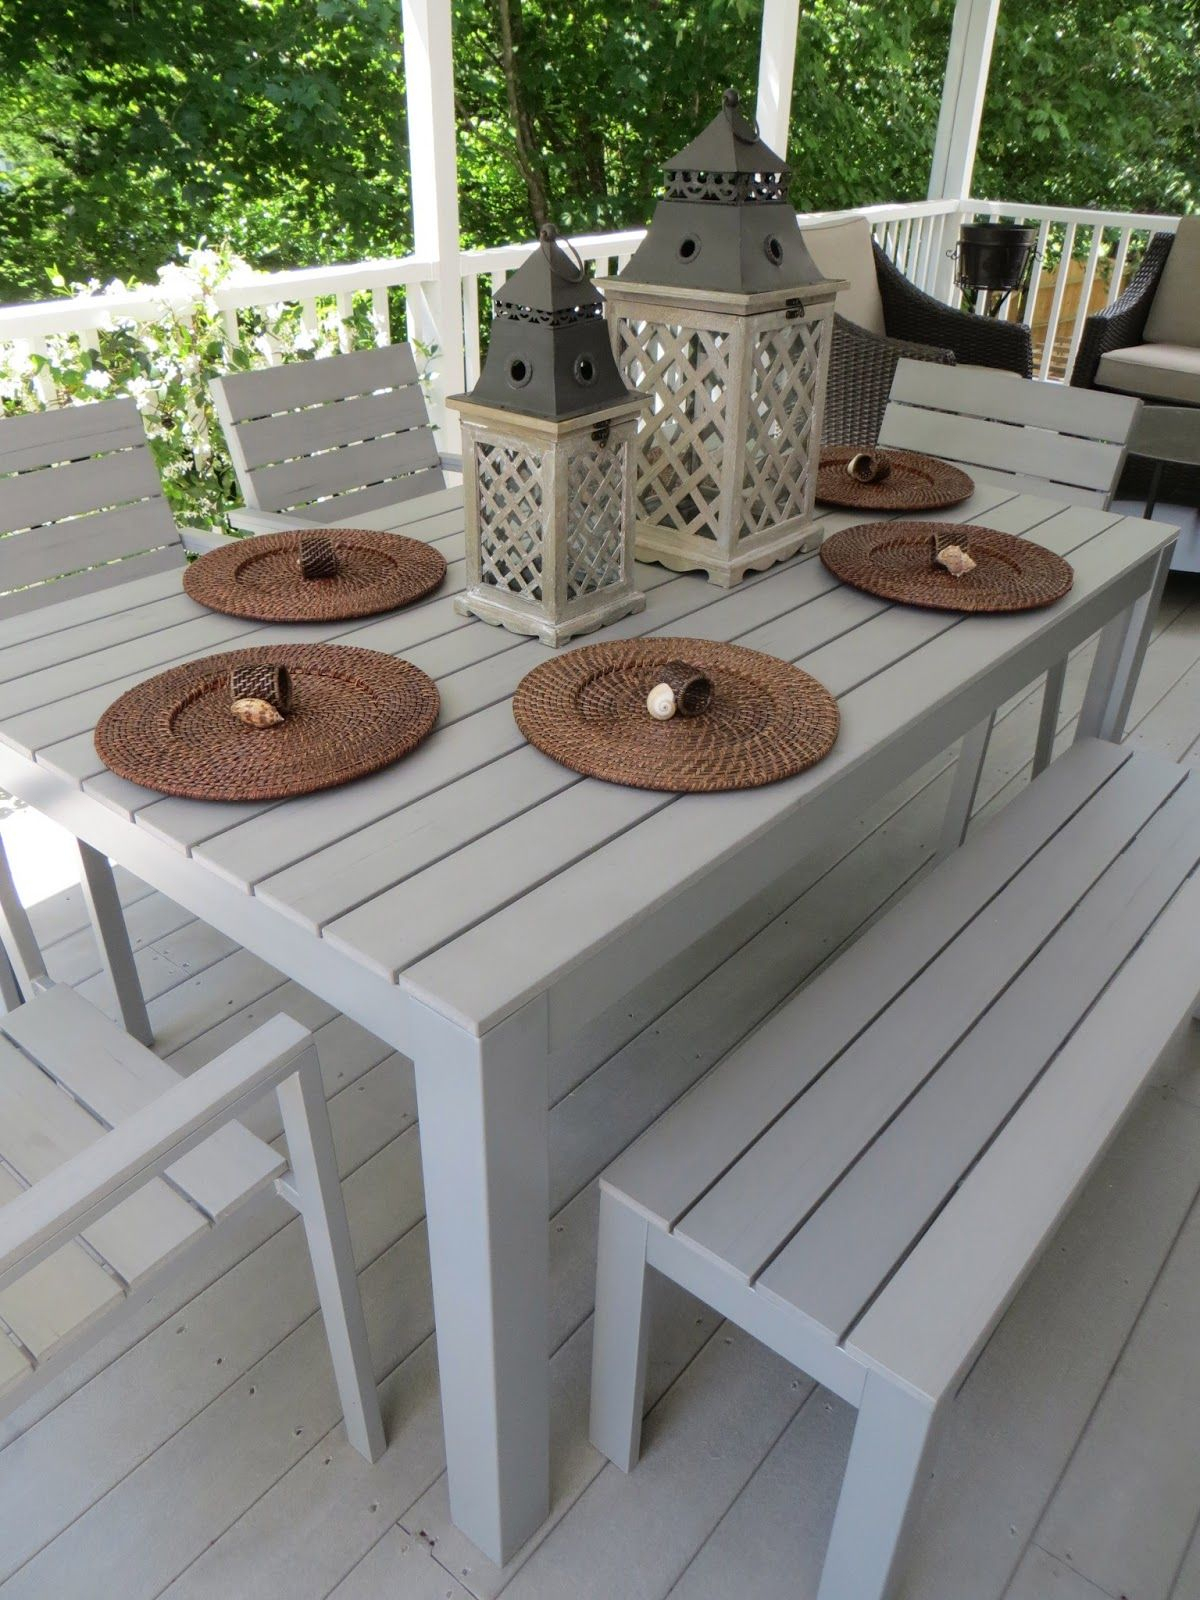 Falster Ikea - I Love The Looks Of This Outdoor Dining Set ... avec Salons De Jardin Ikea